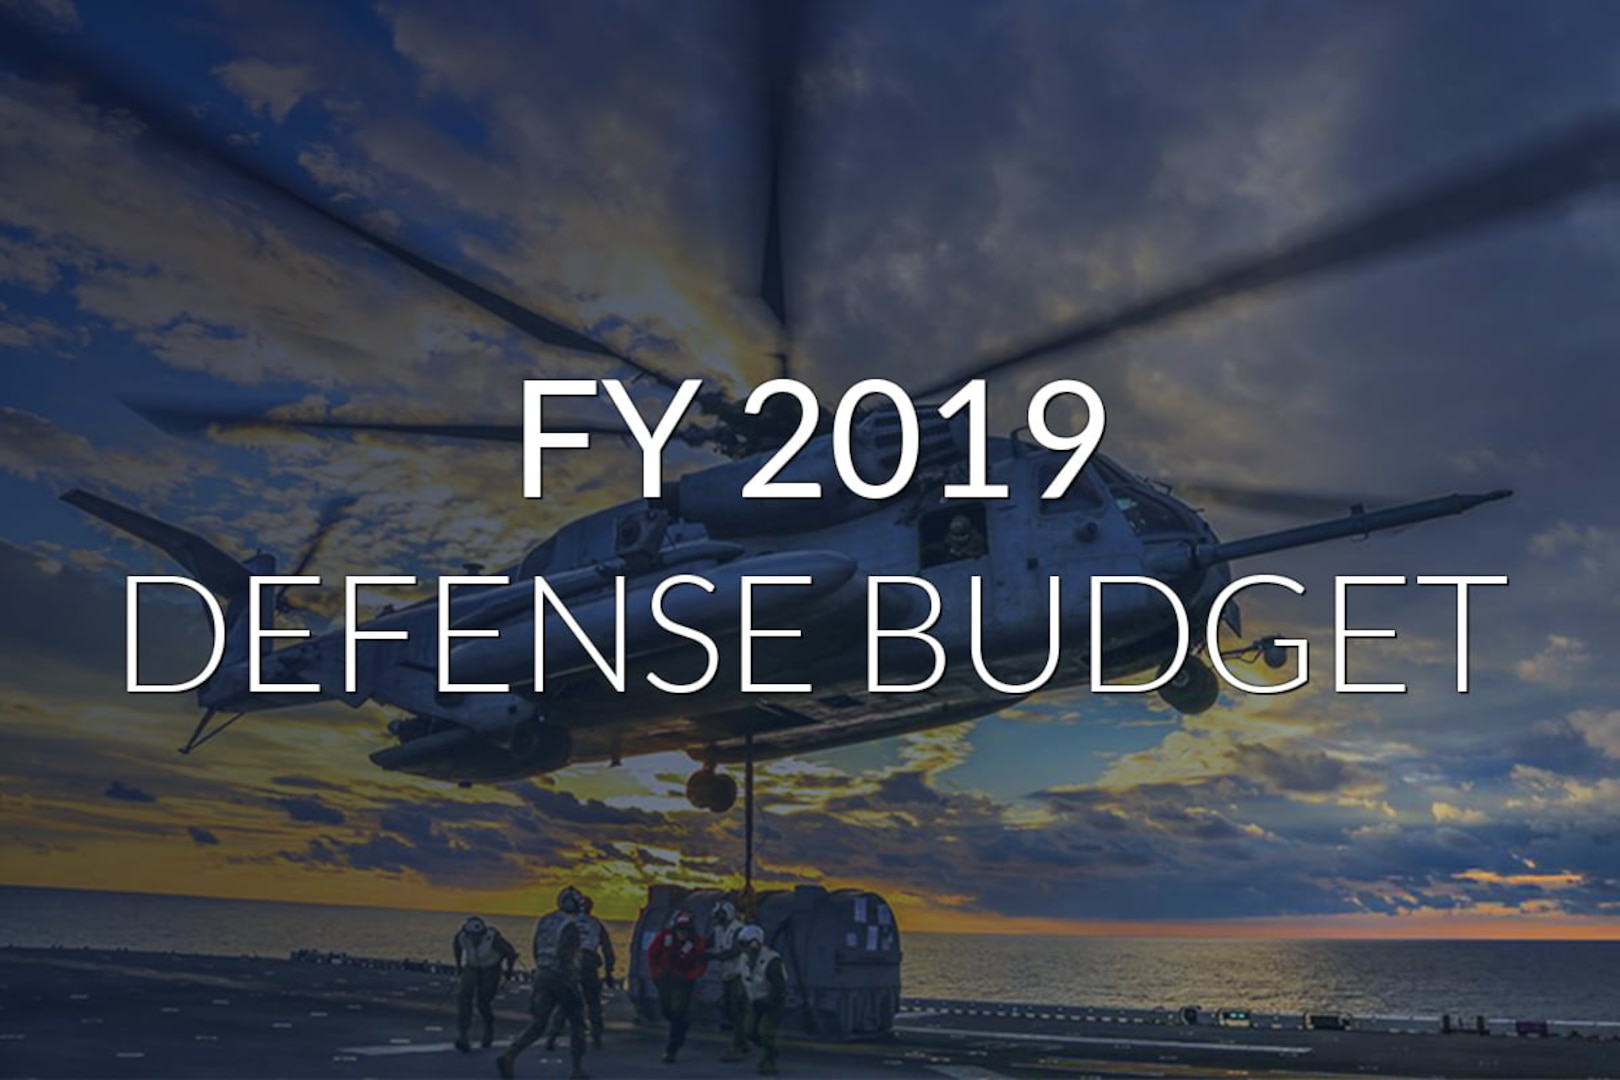 FY2019 Defense Budget